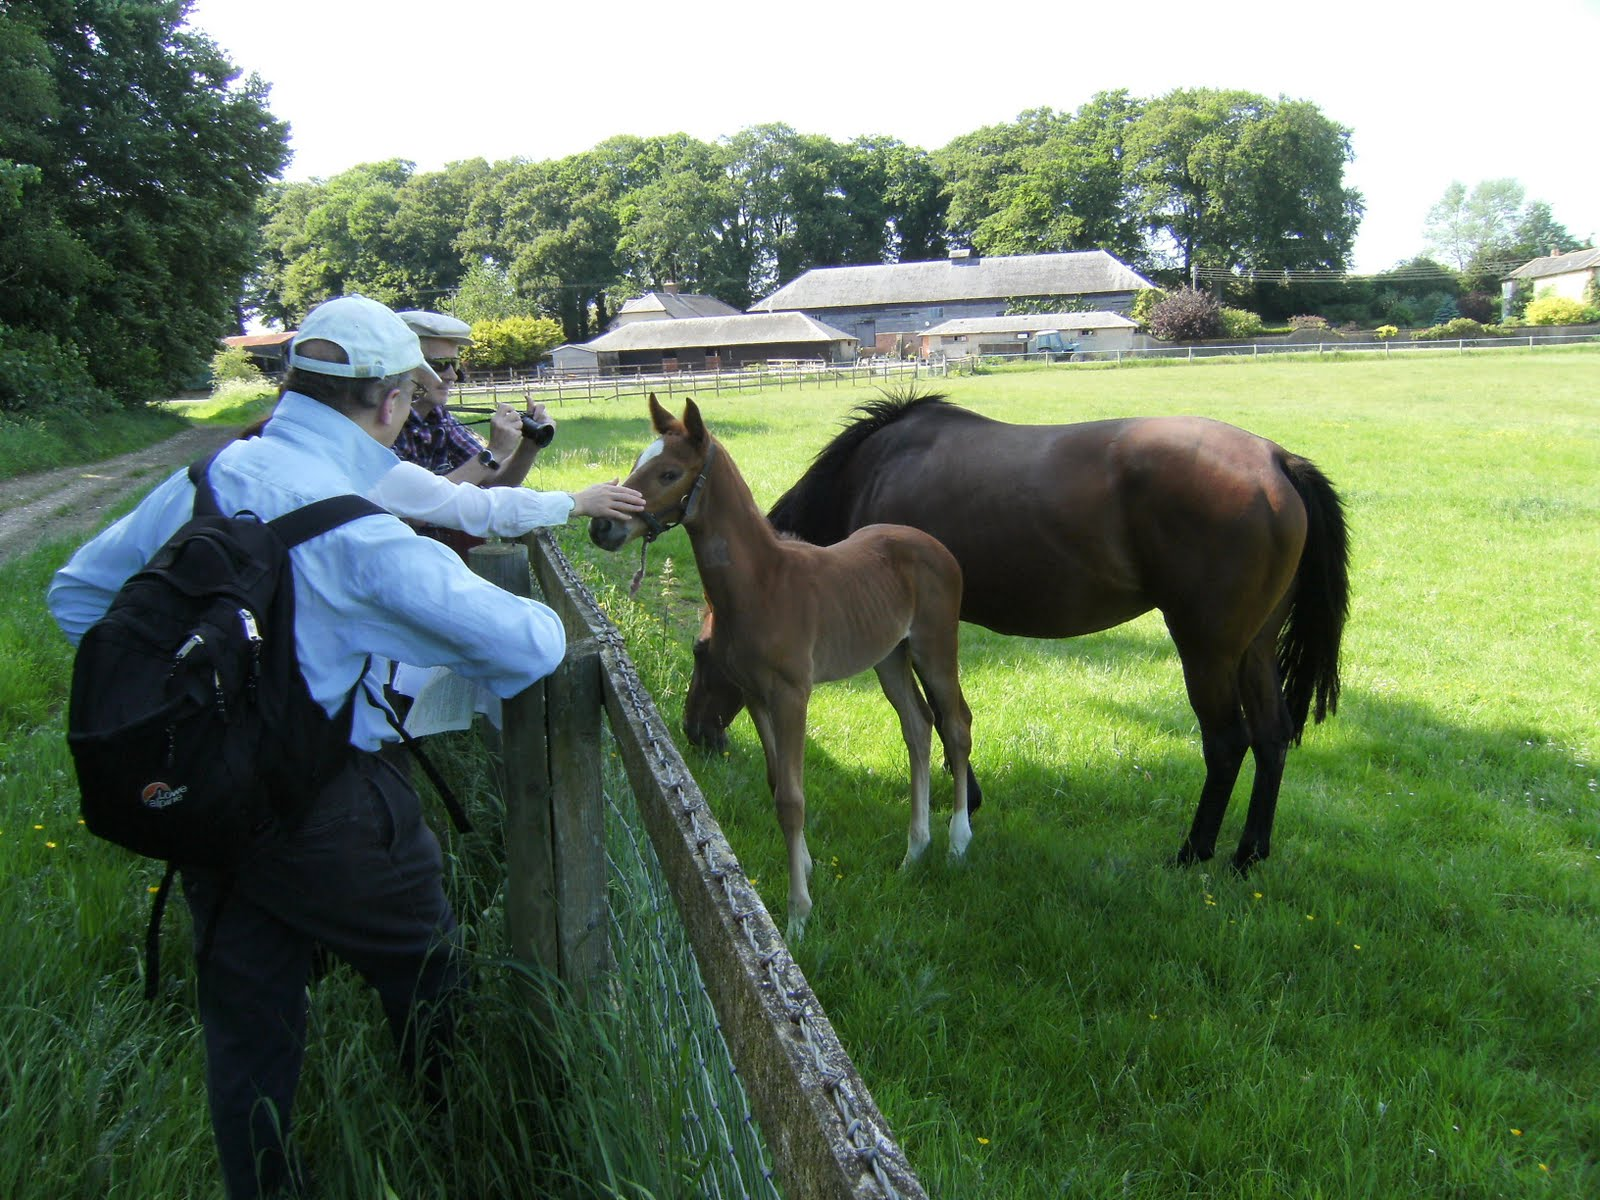 DSCF0873(1) Friendly horses, Springbottom Farm